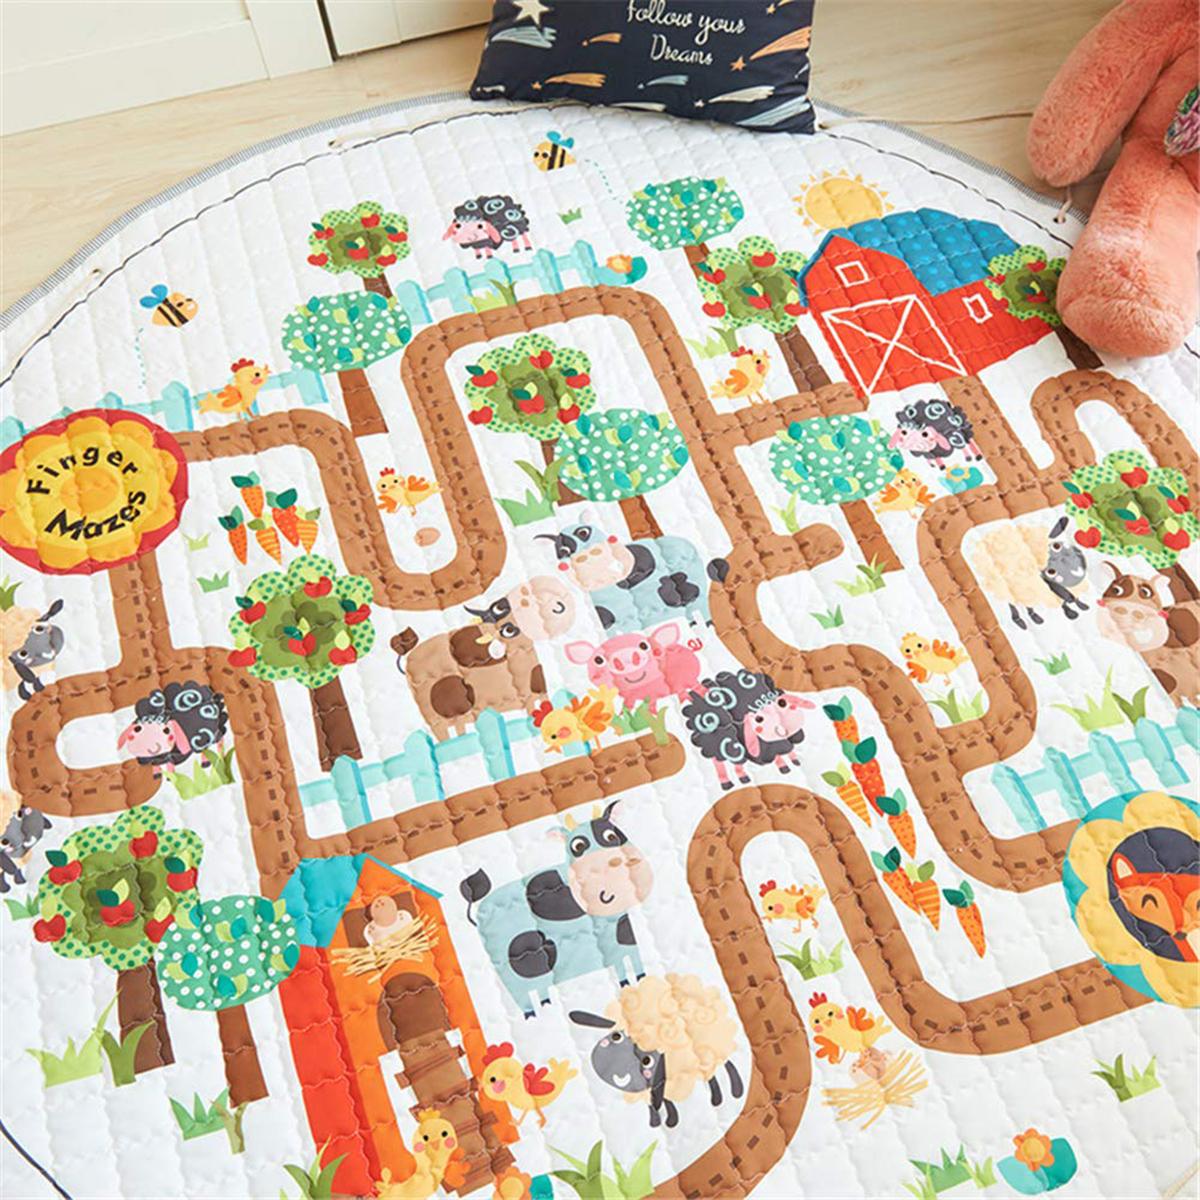 1.45M Gym Baby Play Mat Crawling Blanket Home Large Storage Rug Groundhog Floor Baby Crawling Rug